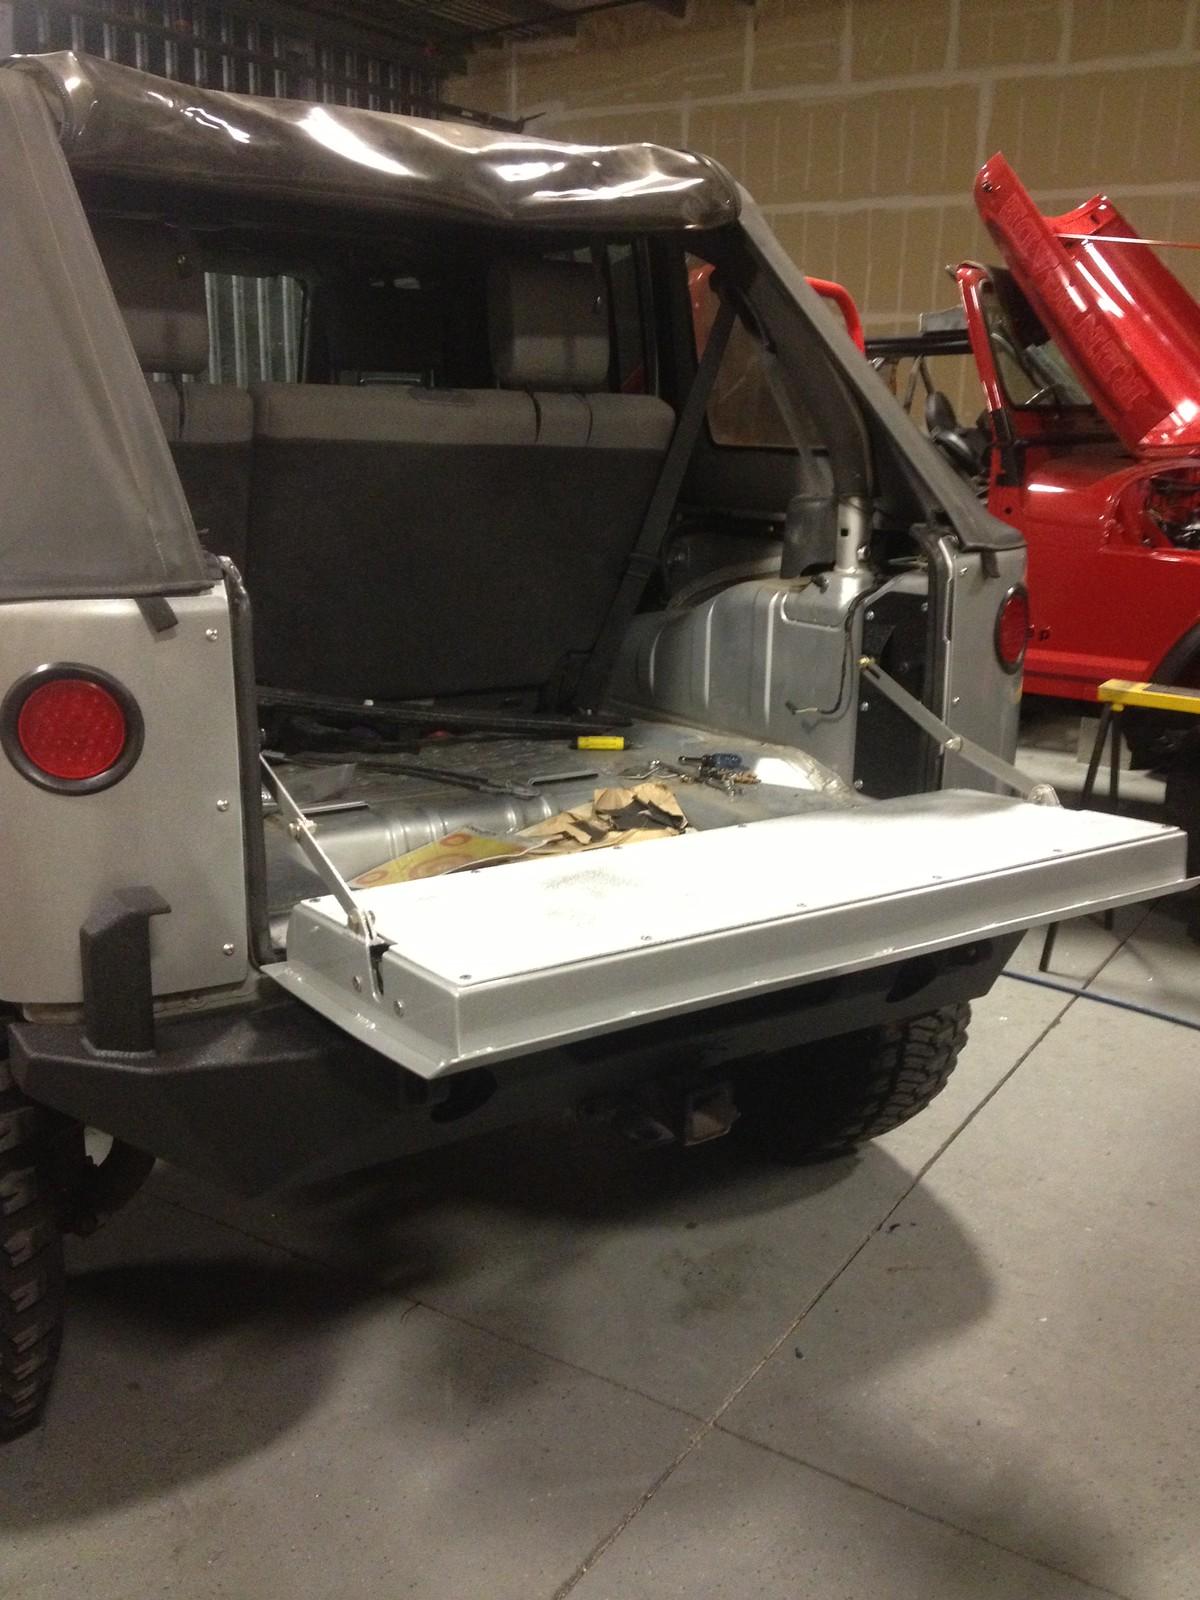 Aluminum Jeep Jk Drop Tailgate Jk Forum Com The Top